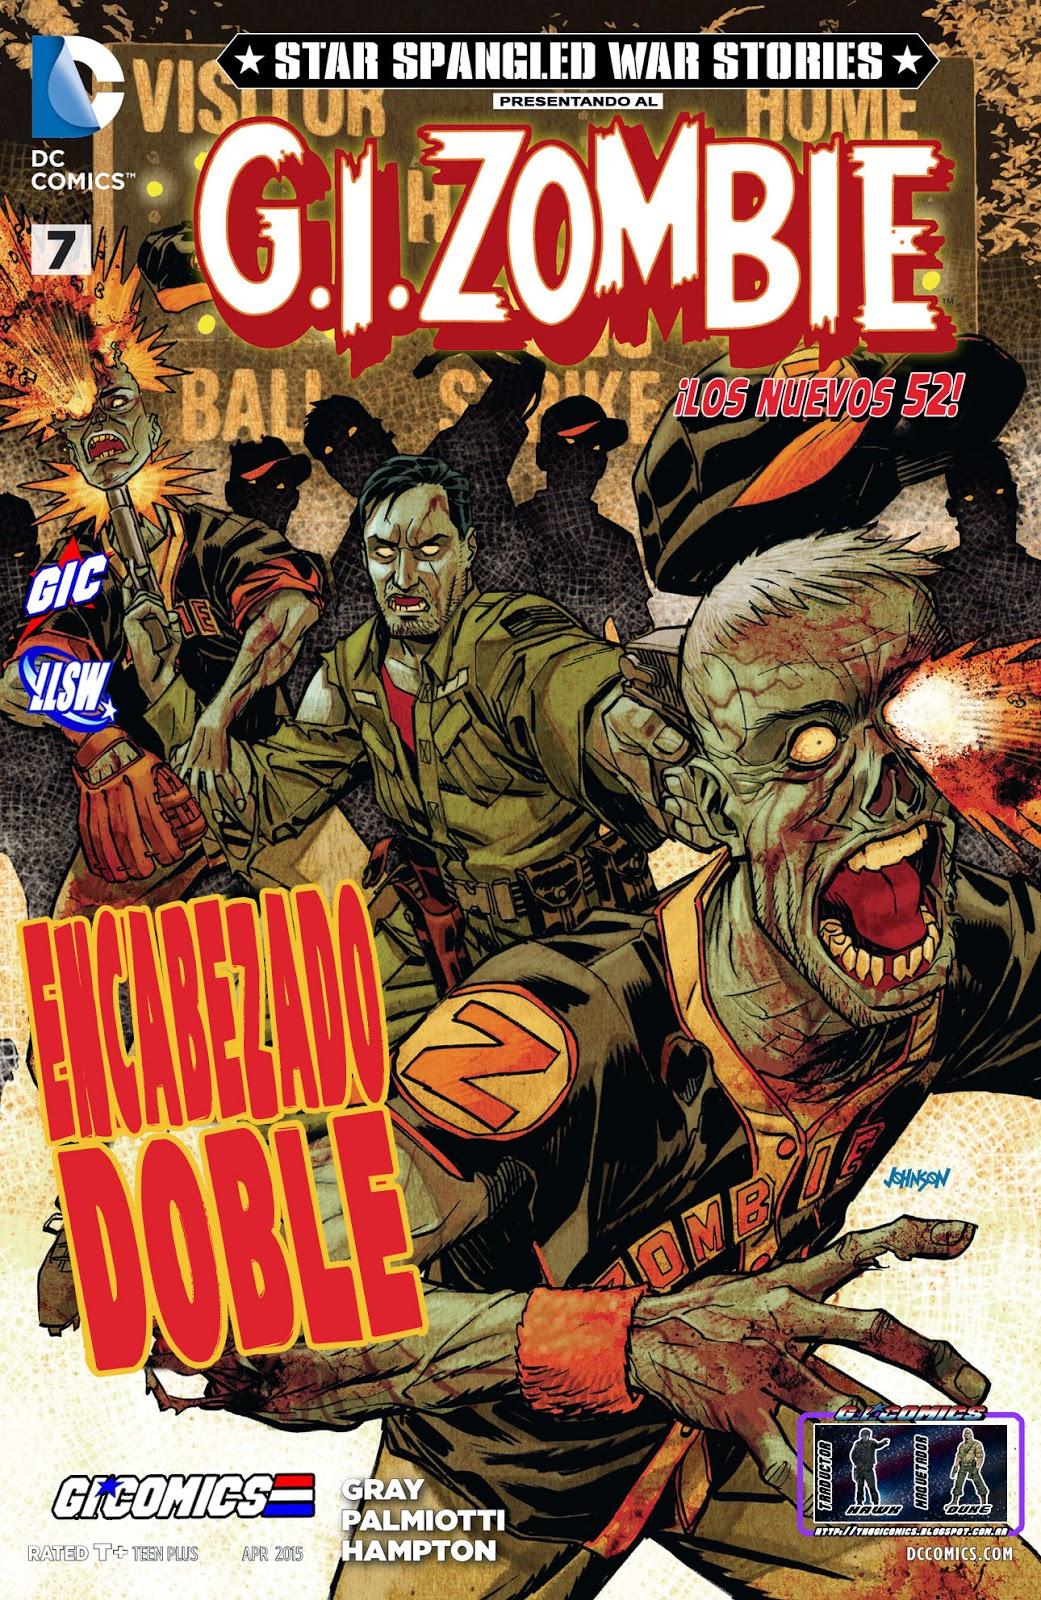 http://www.mediafire.com/download/n4zvbyjiyc0zuw4/Star+Spangled+War+Stories+07+G.I.Comics+Hawk-Duke.cbr